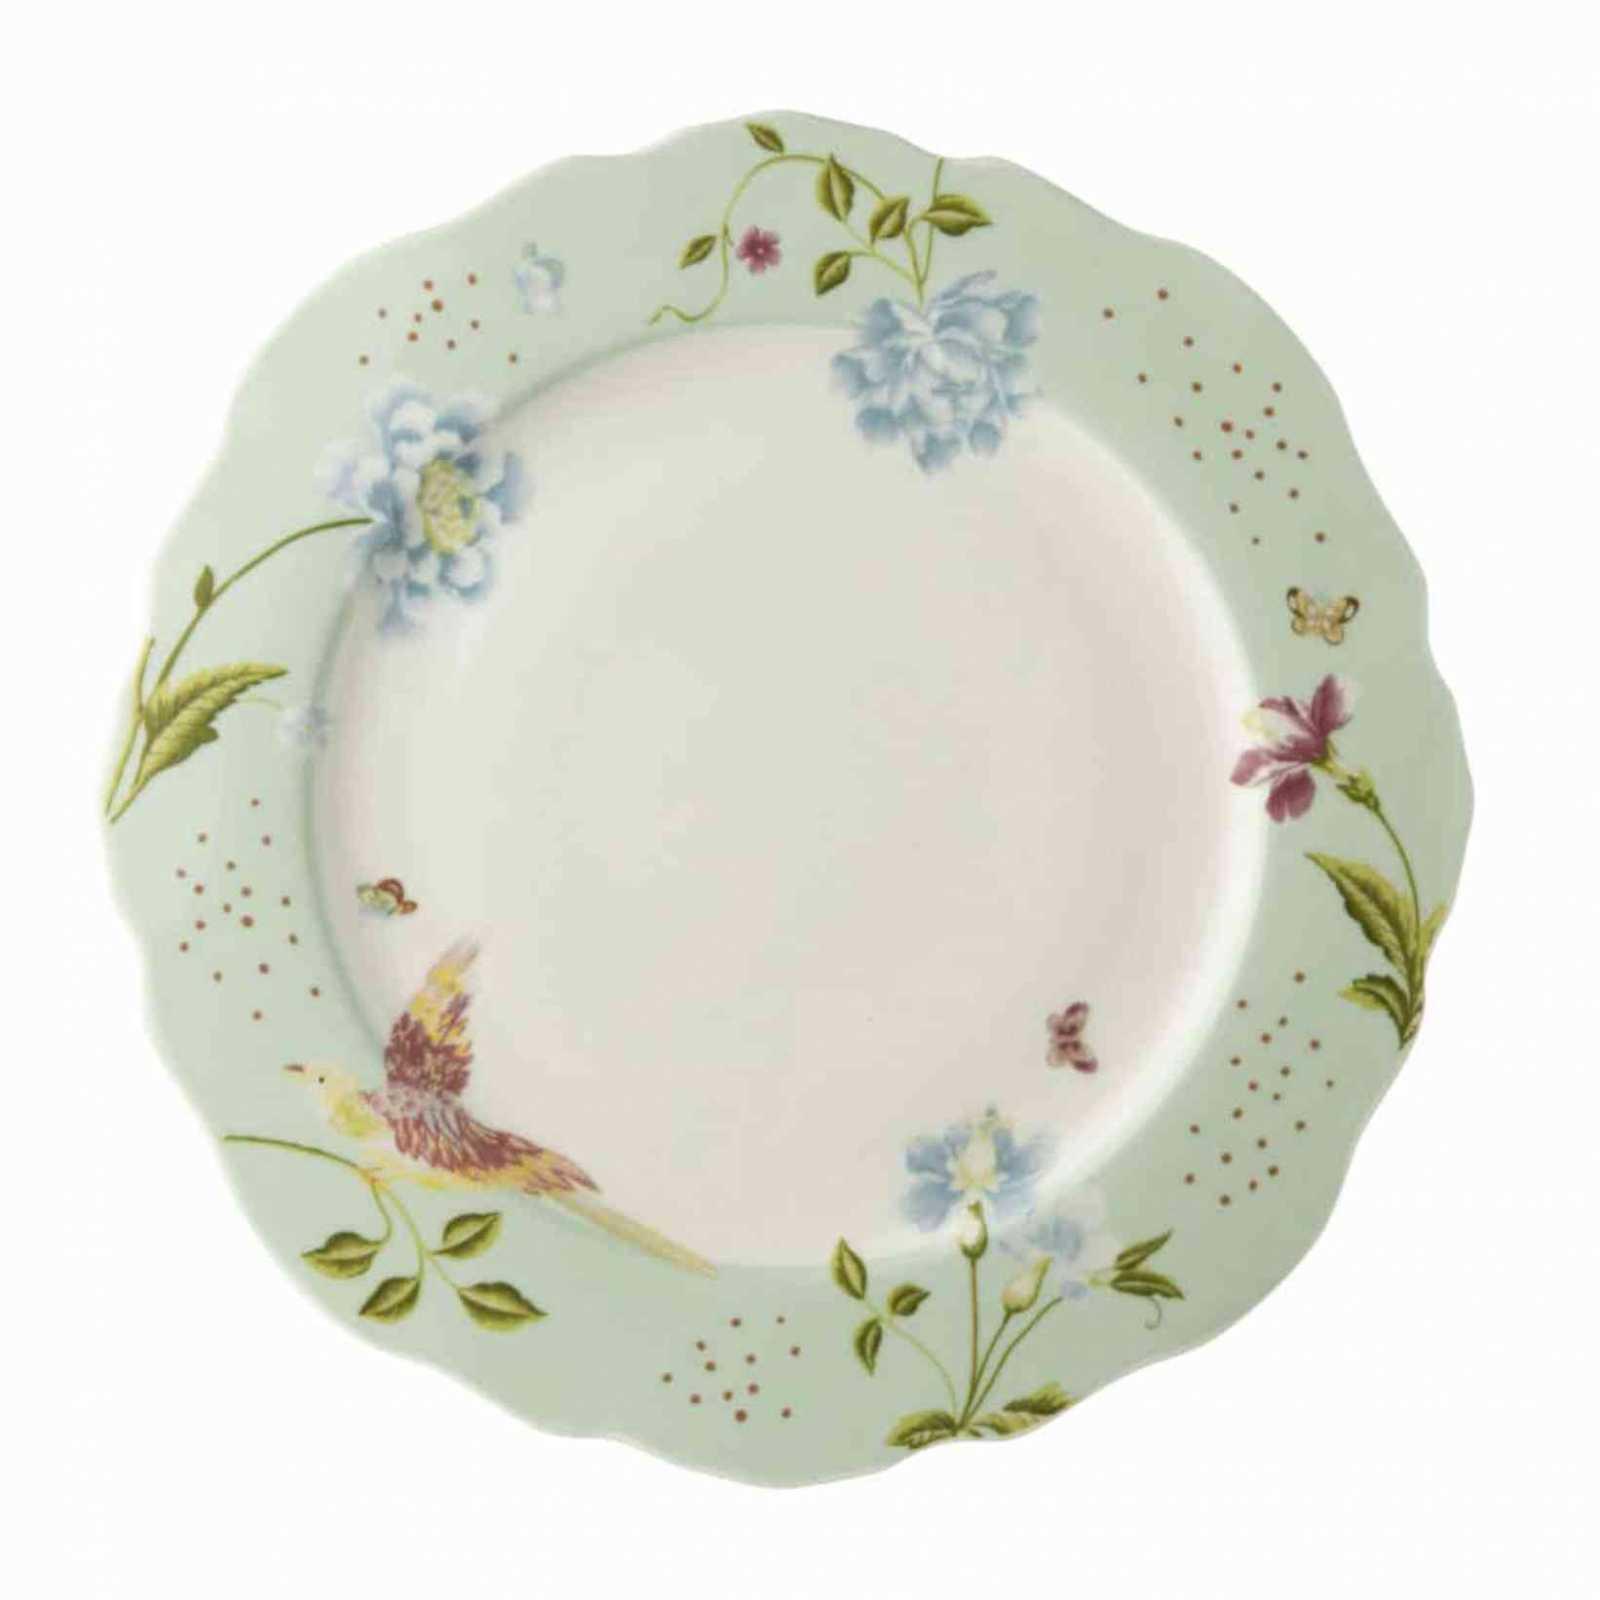 Онлайн каталог PROMENU: Тарелка Laura Ashley HERITAGE, диаметр 24,5 см, ментоловый с цветами и птицей                               180454